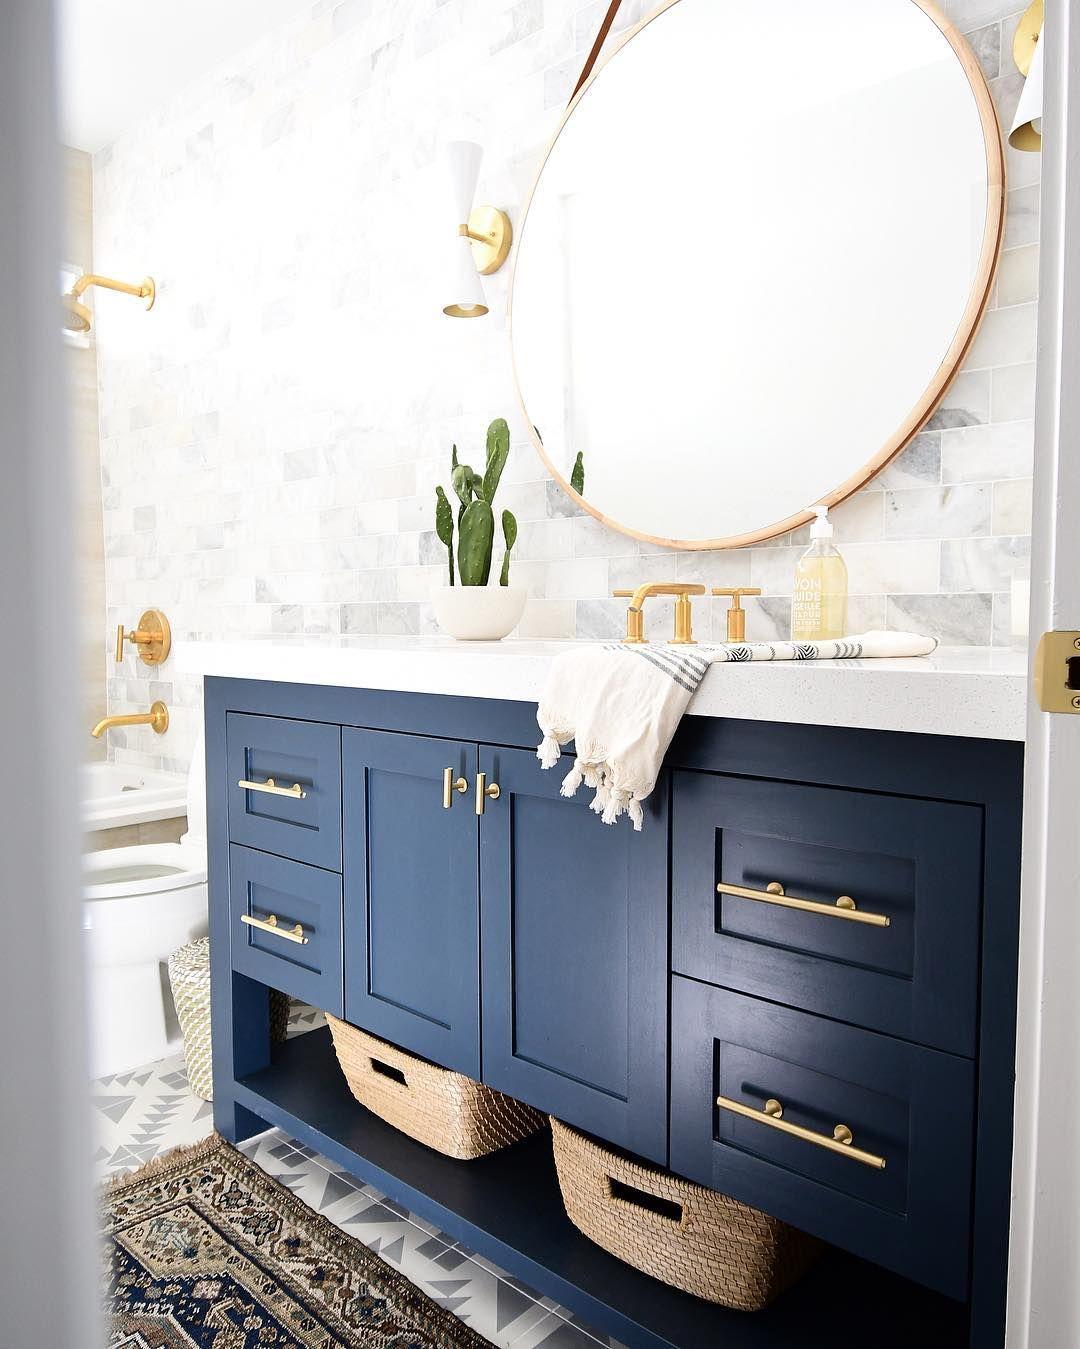 Blue And Gold Bathroom Bathroom Interior Design Beautiful Bathroom Decor Bathroom Inspiration